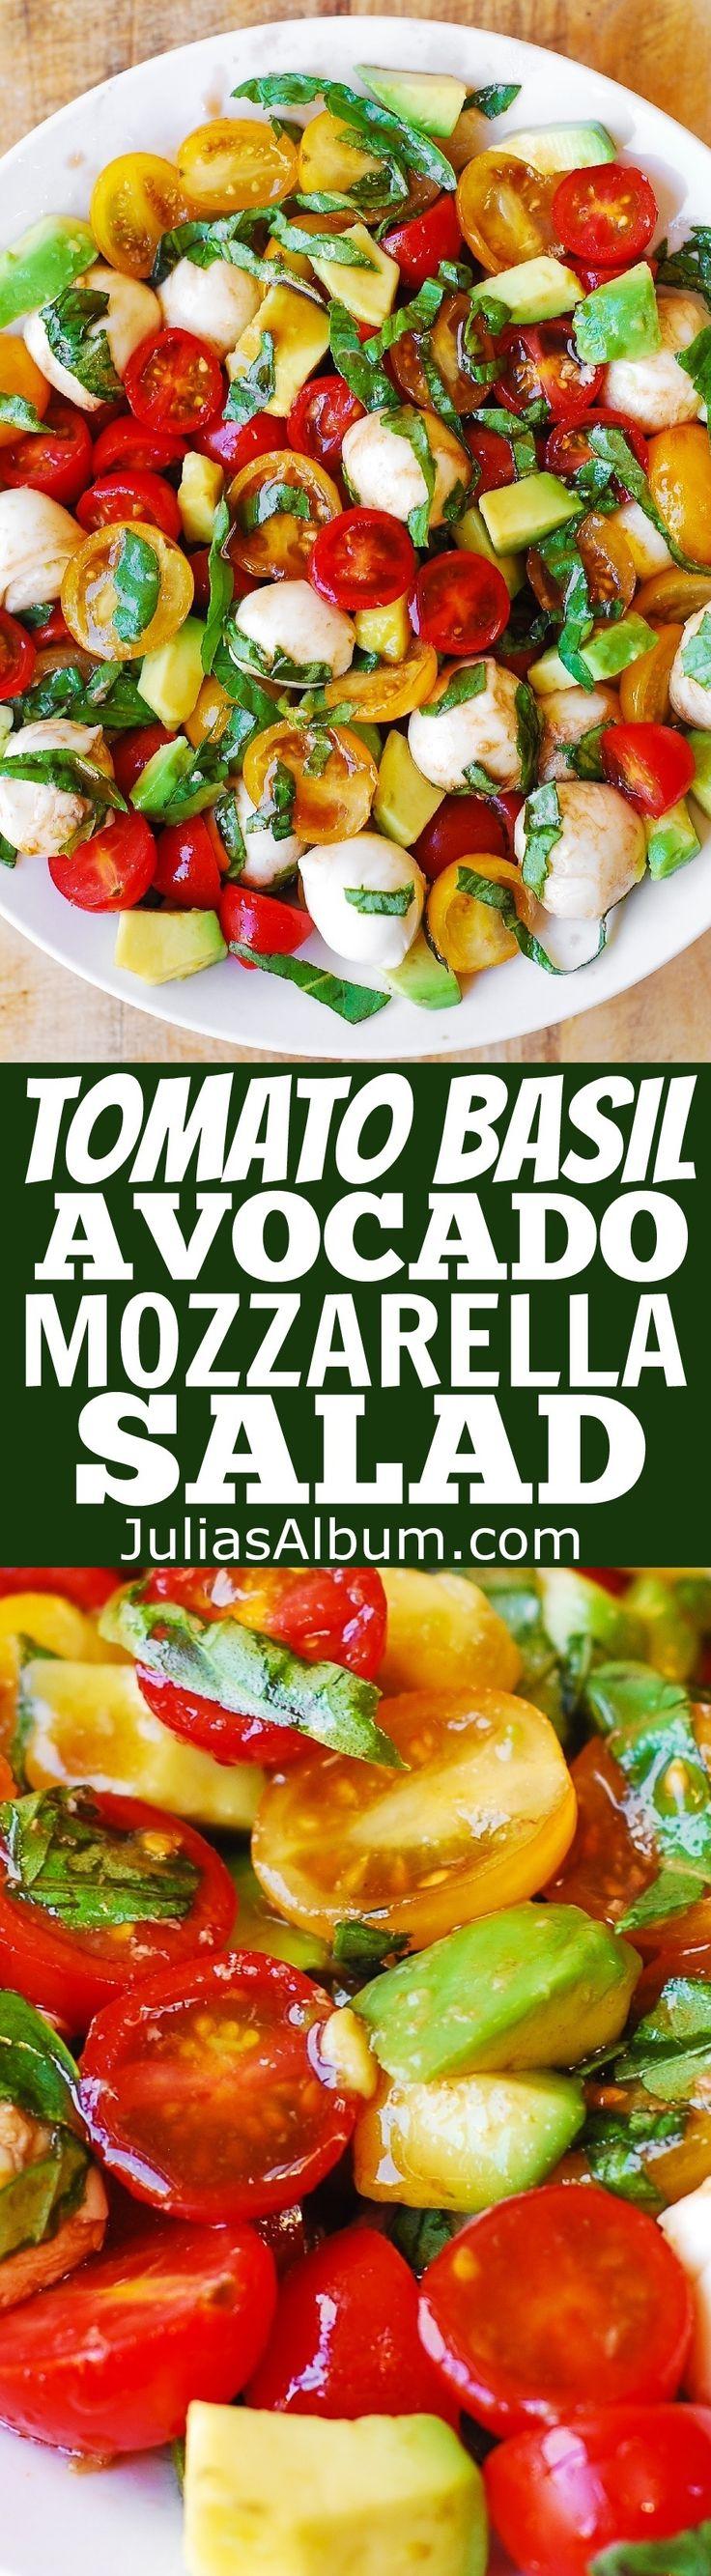 Tomato Basil Avocado Mozzarella Salad with Balsamic Dressing - #healthy #glutenfree #SUMMER